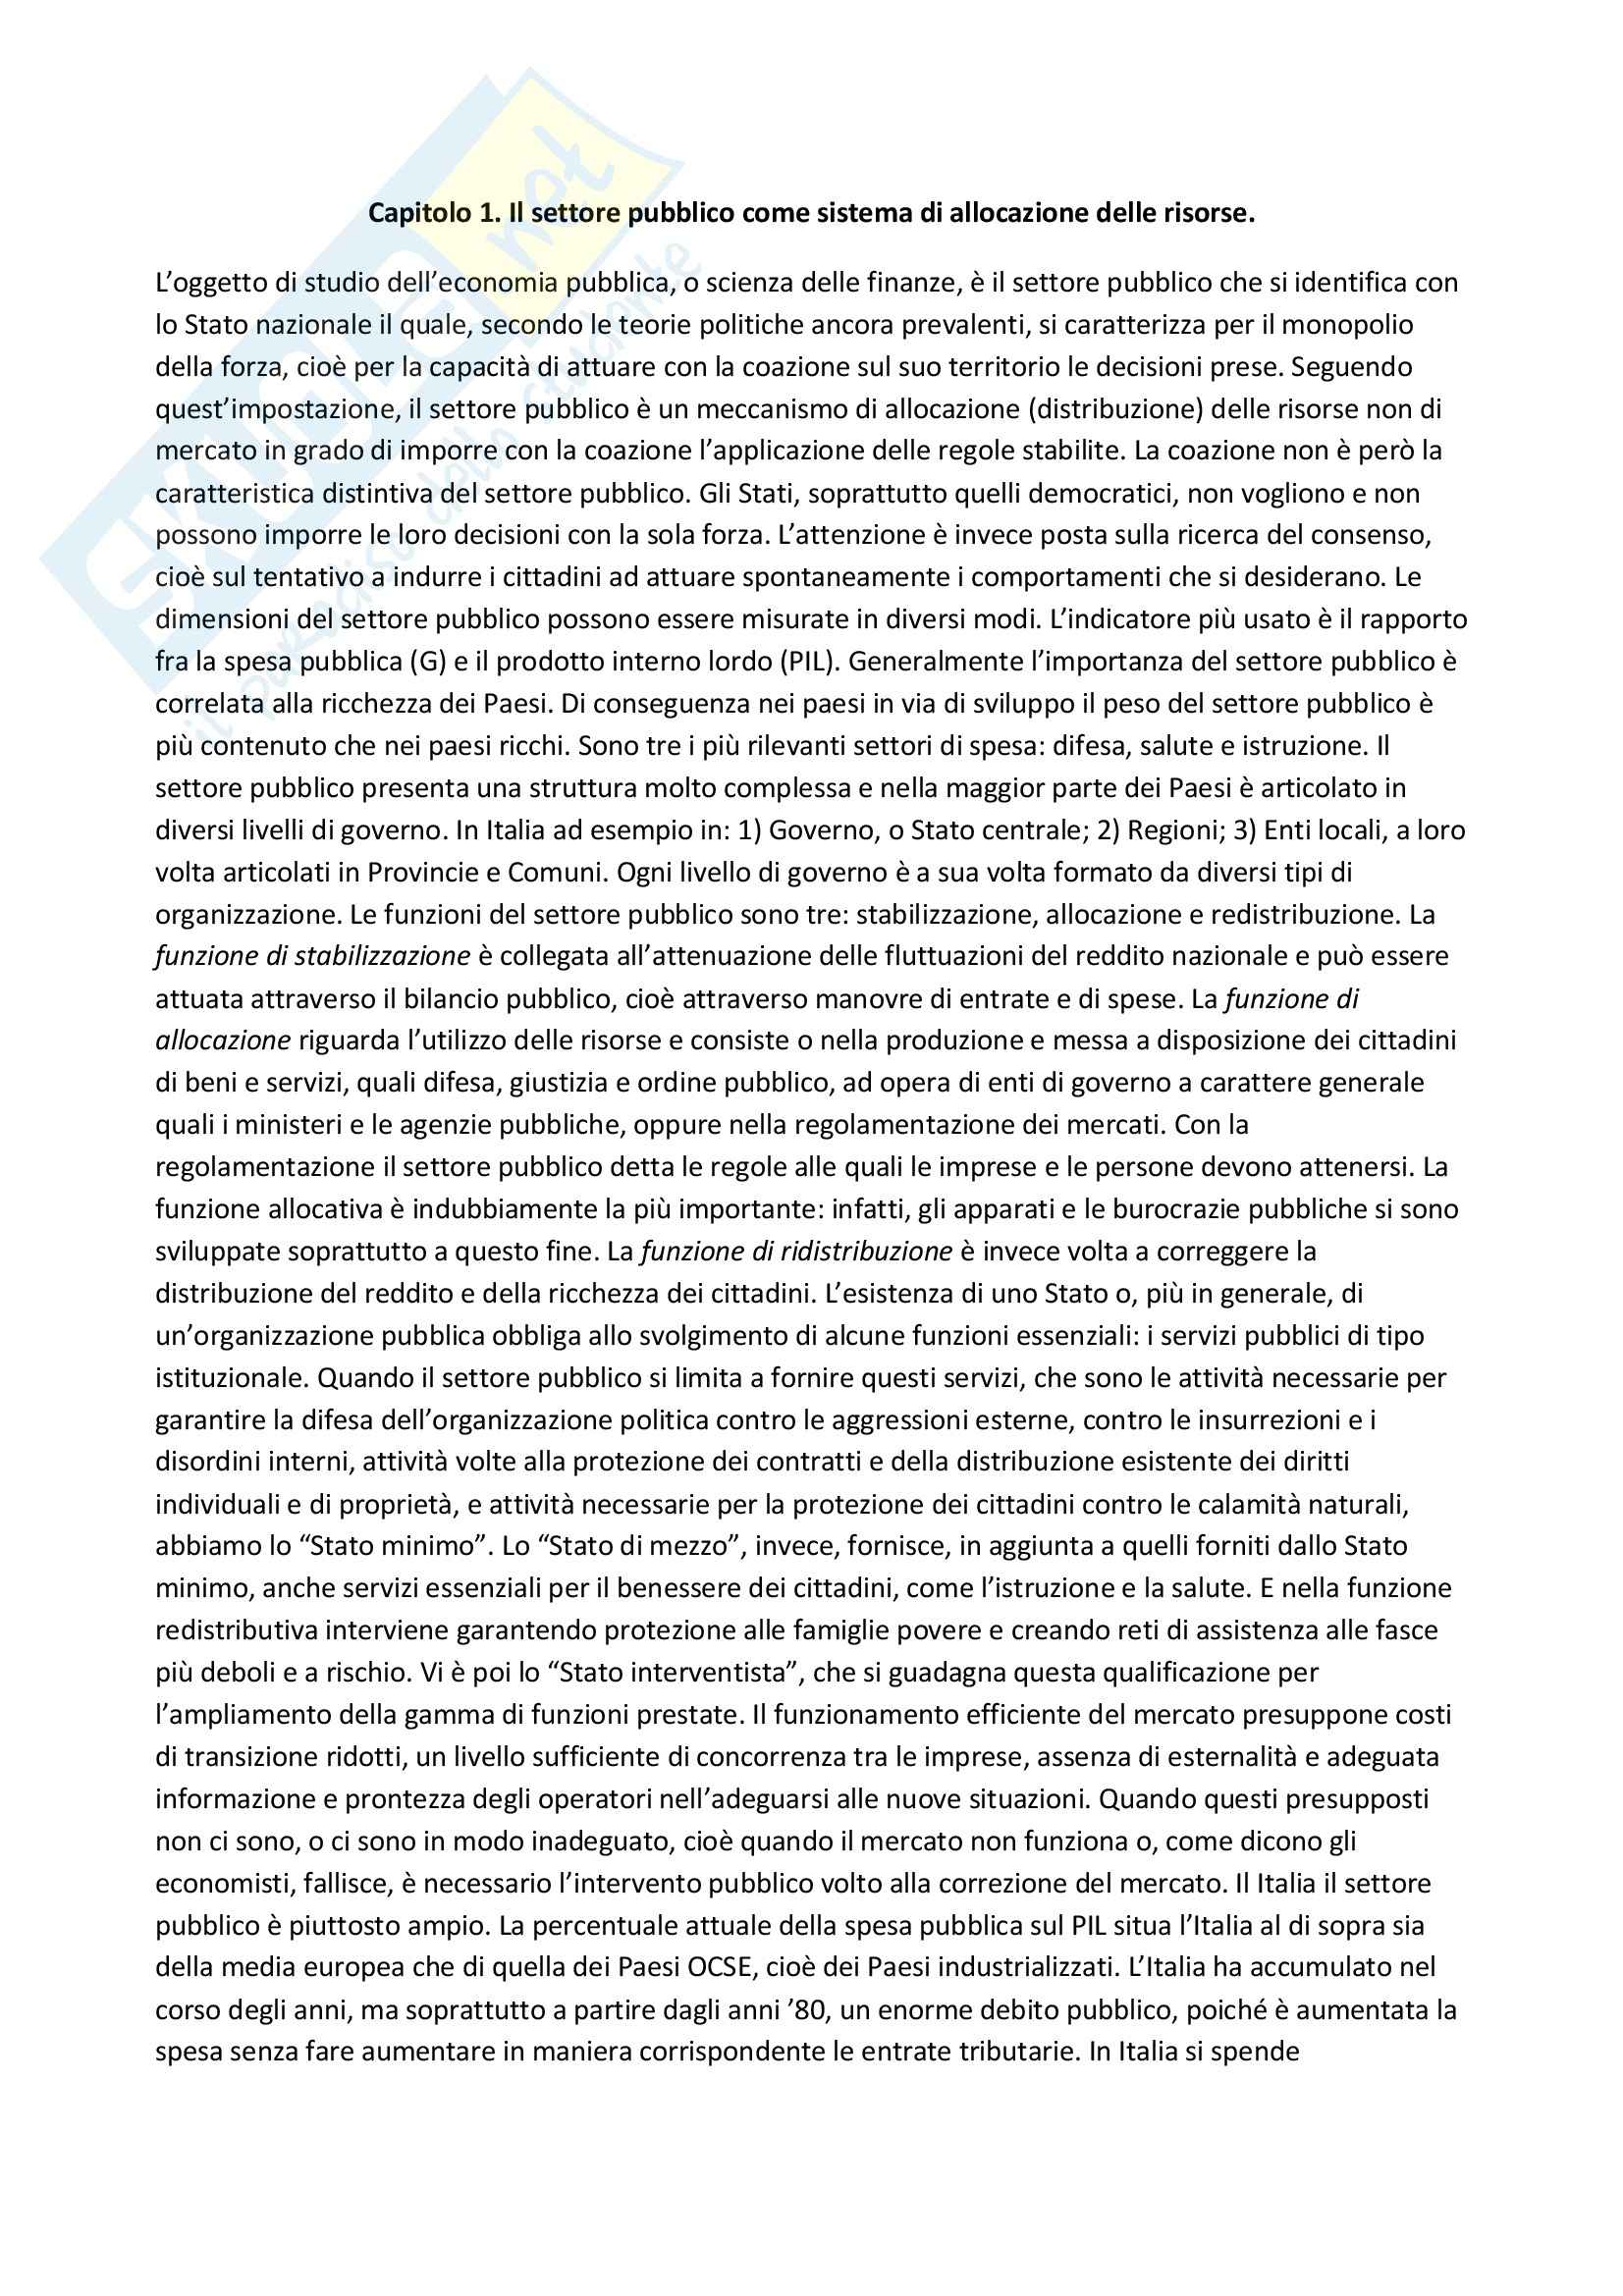 appunto M. Trimarchi Economia pubblica